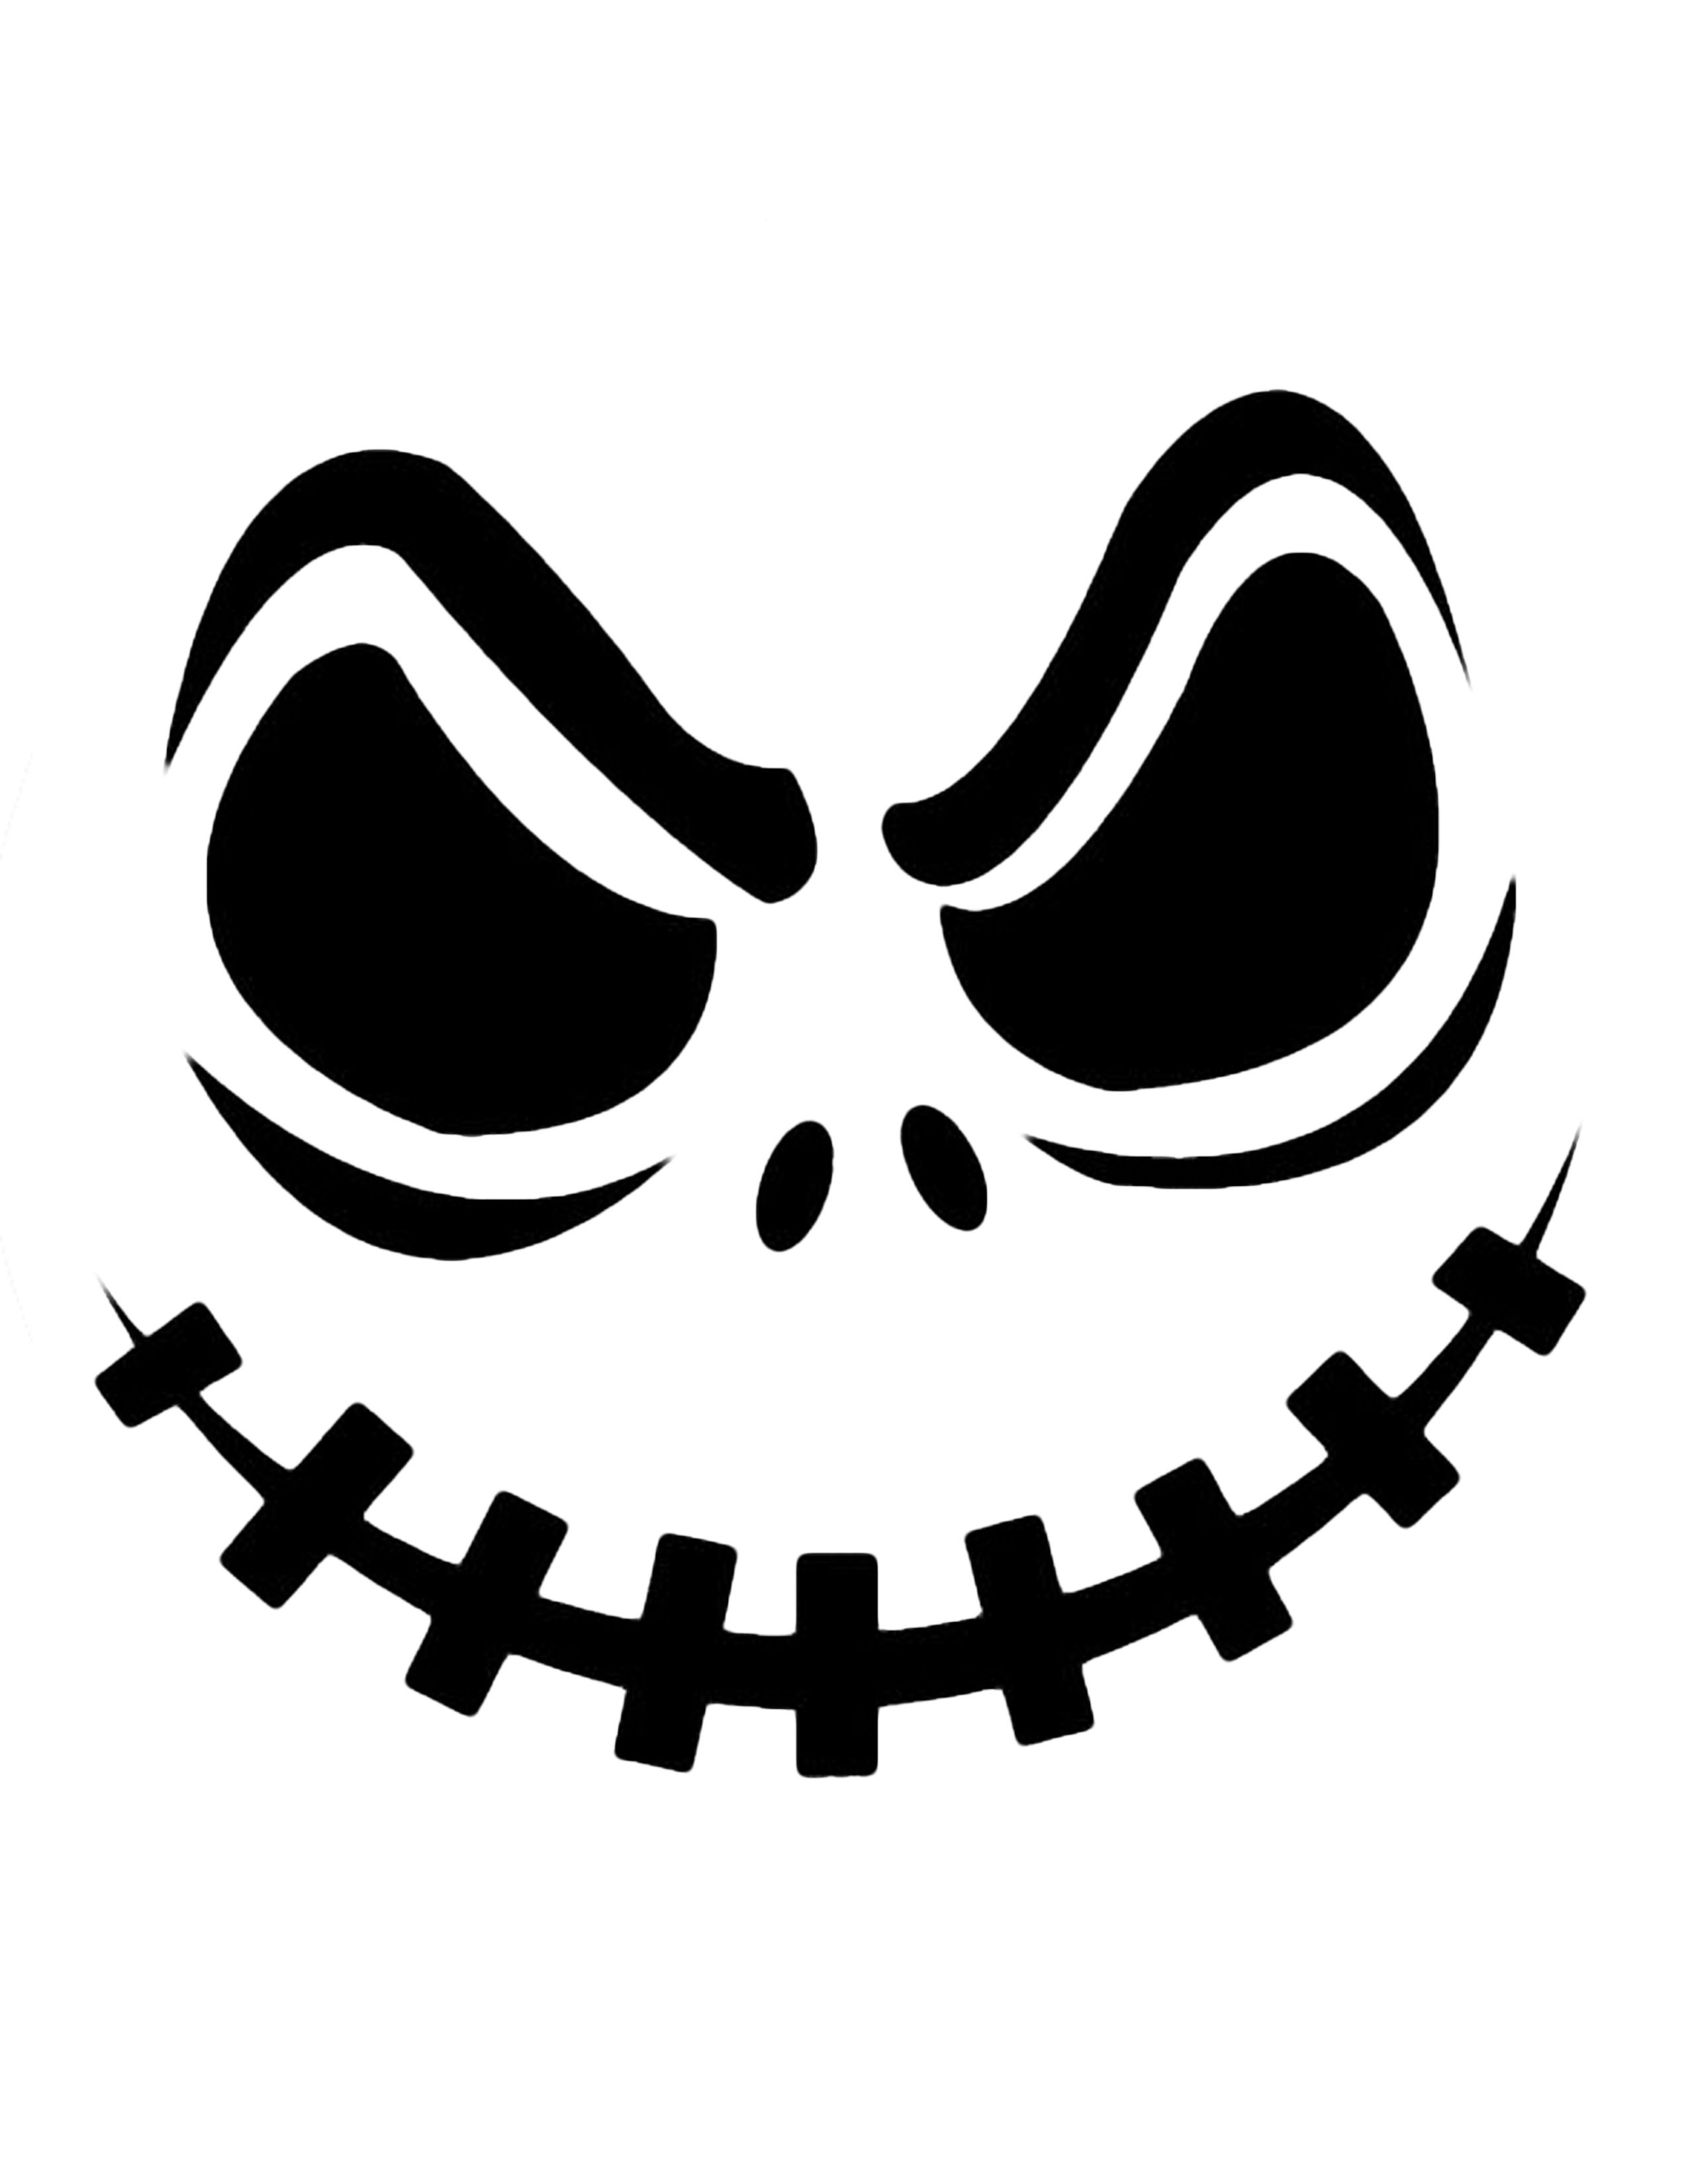 Halloween Pumpkin Stencils Free Printable | Silhouette | Pumpkin - Pumpkin Templates Free Printable